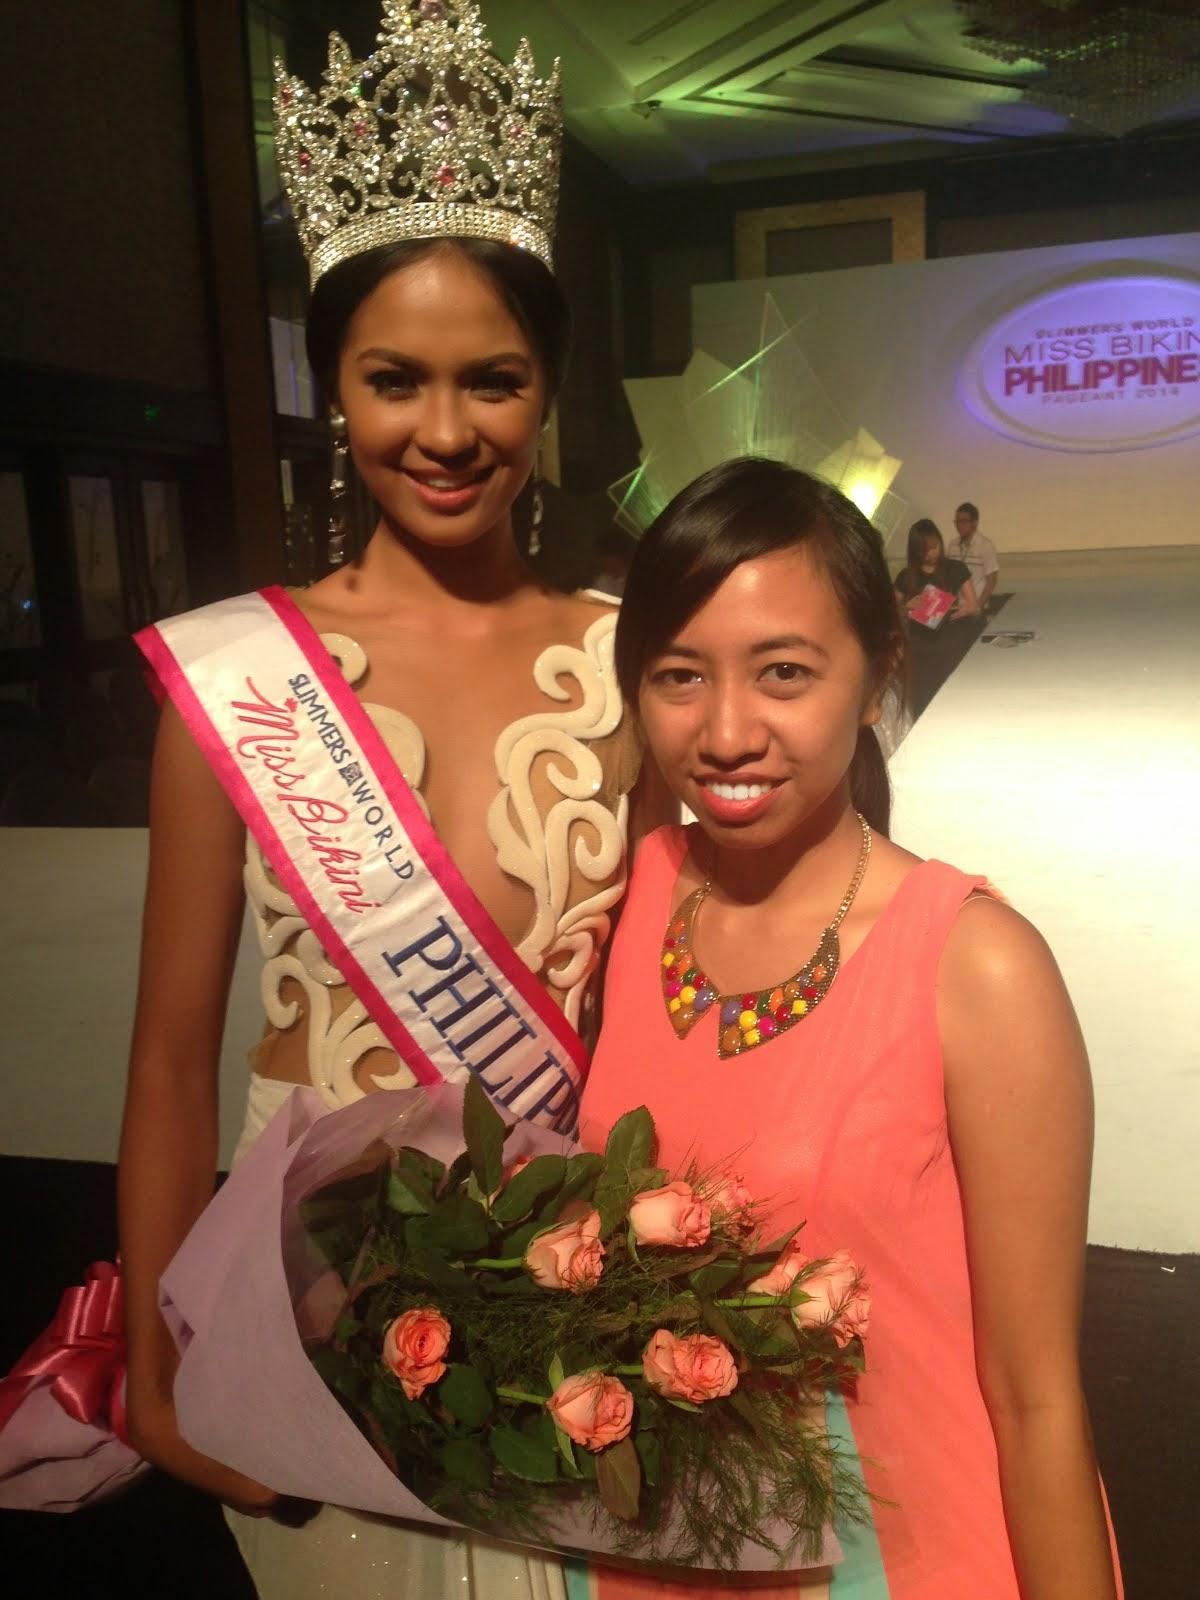 MISS BIKINI PHILIPPINES 2014